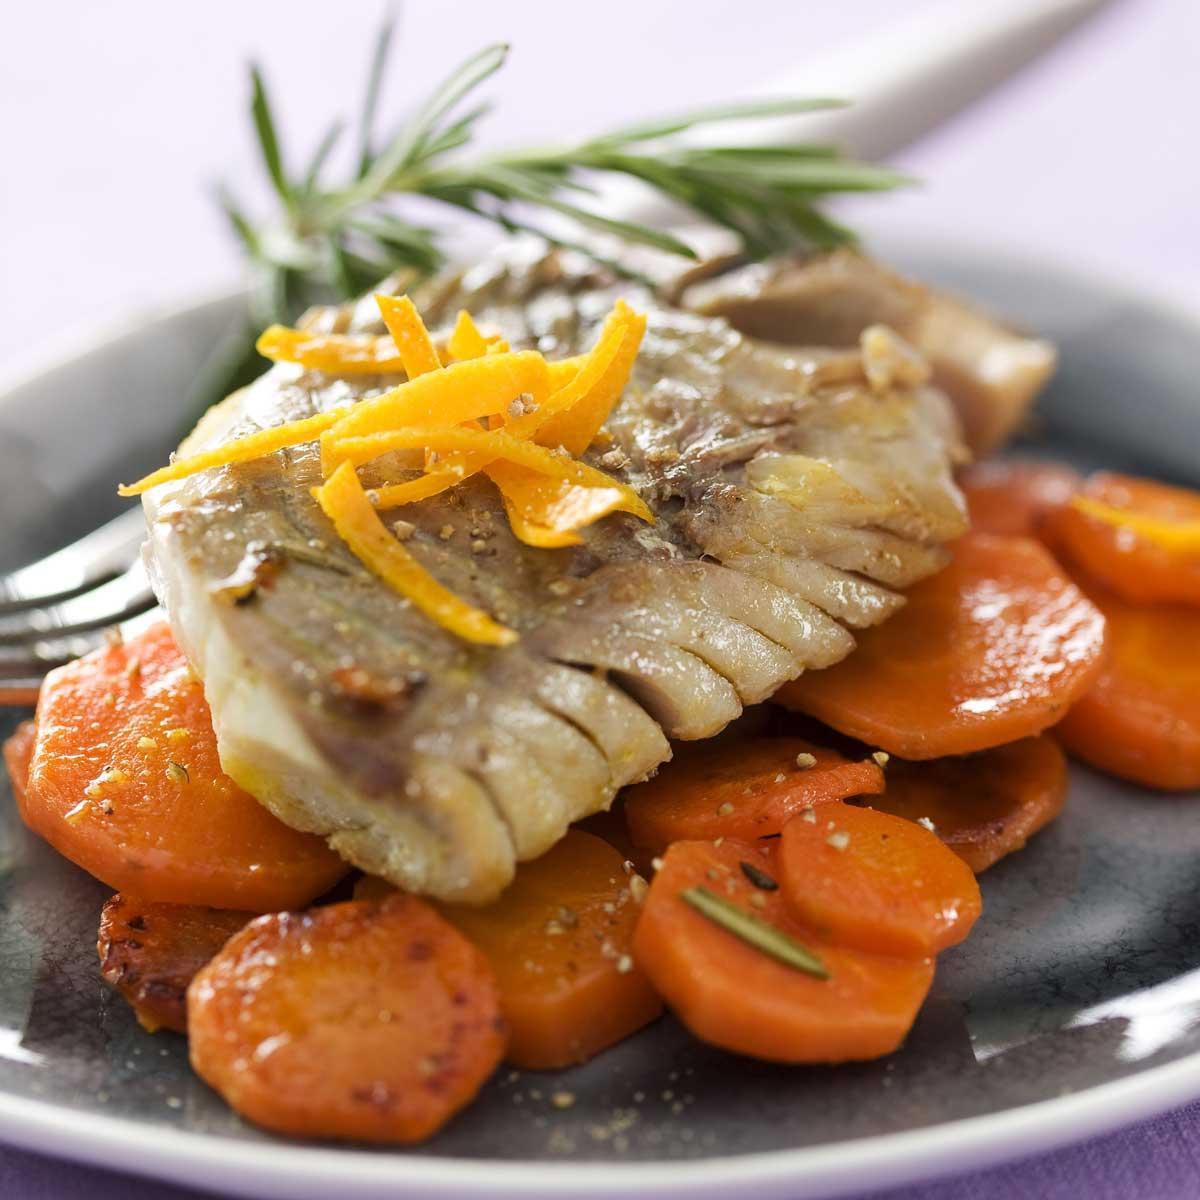 recette filet de lieu noir caram lis l 39 orange et carottes cuisine madame figaro. Black Bedroom Furniture Sets. Home Design Ideas